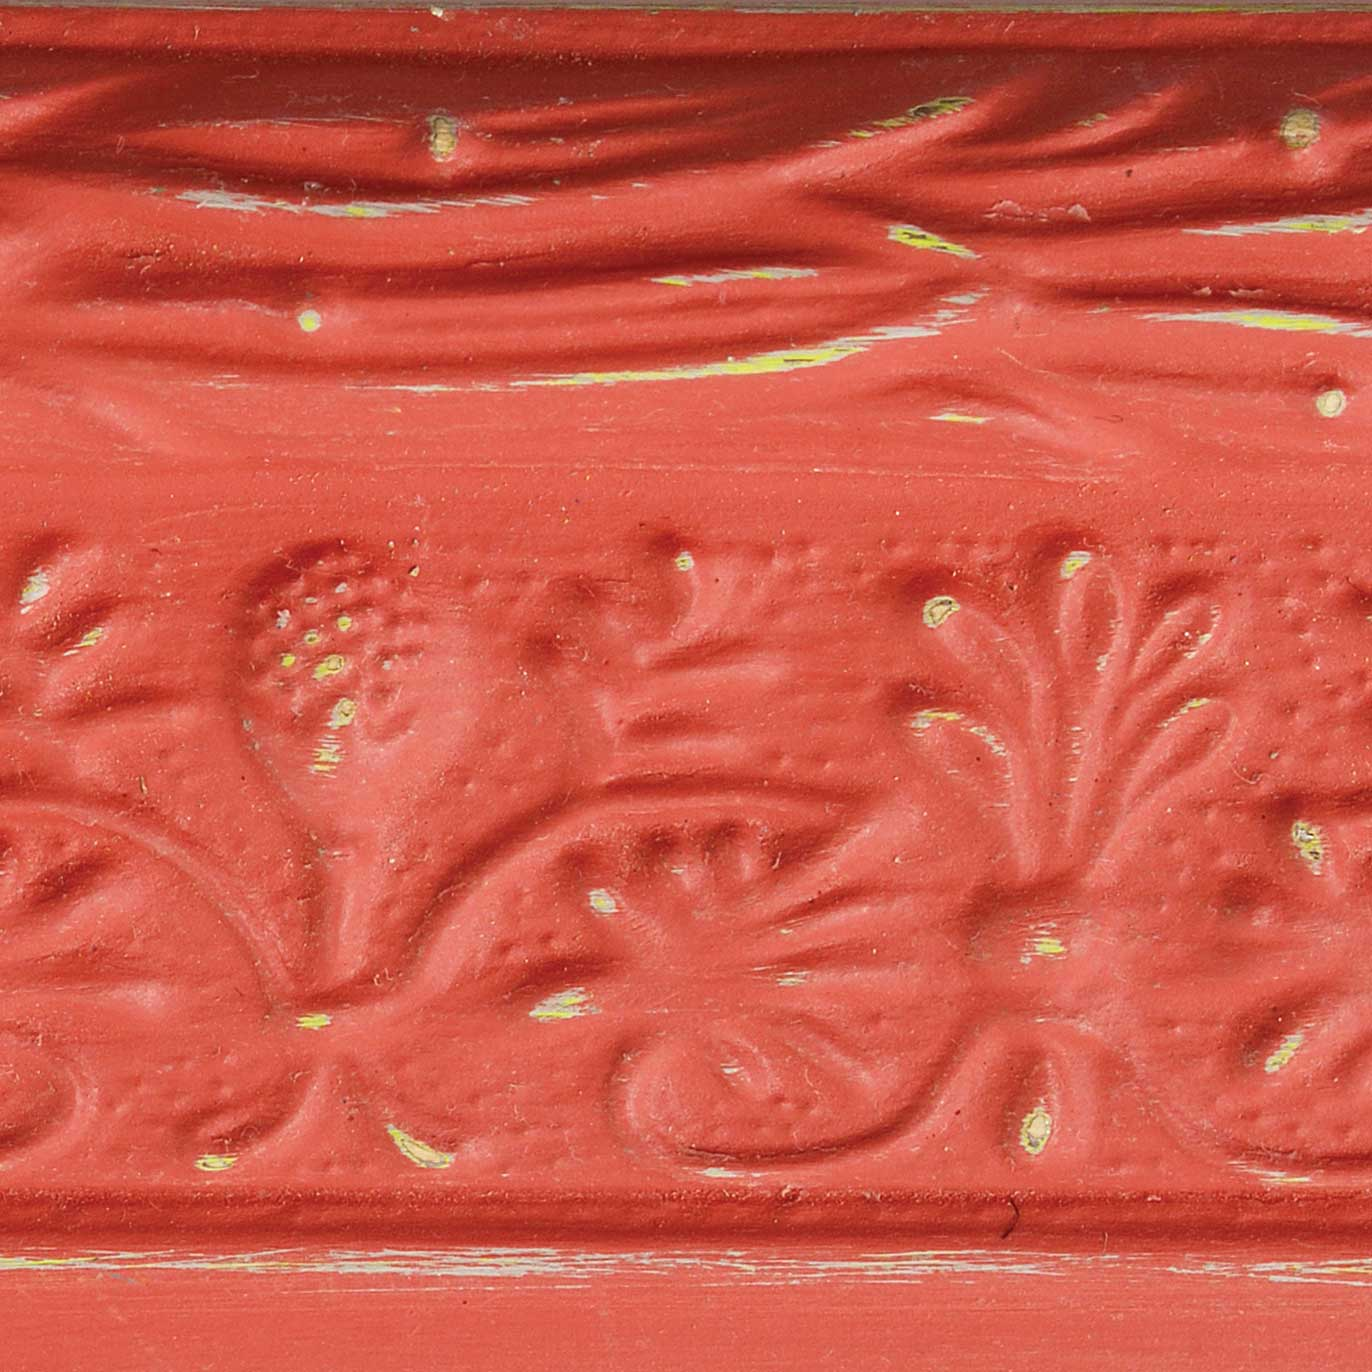 FolkArt ® Home Decor™ Chalk - Salmon Coral, 8 oz.